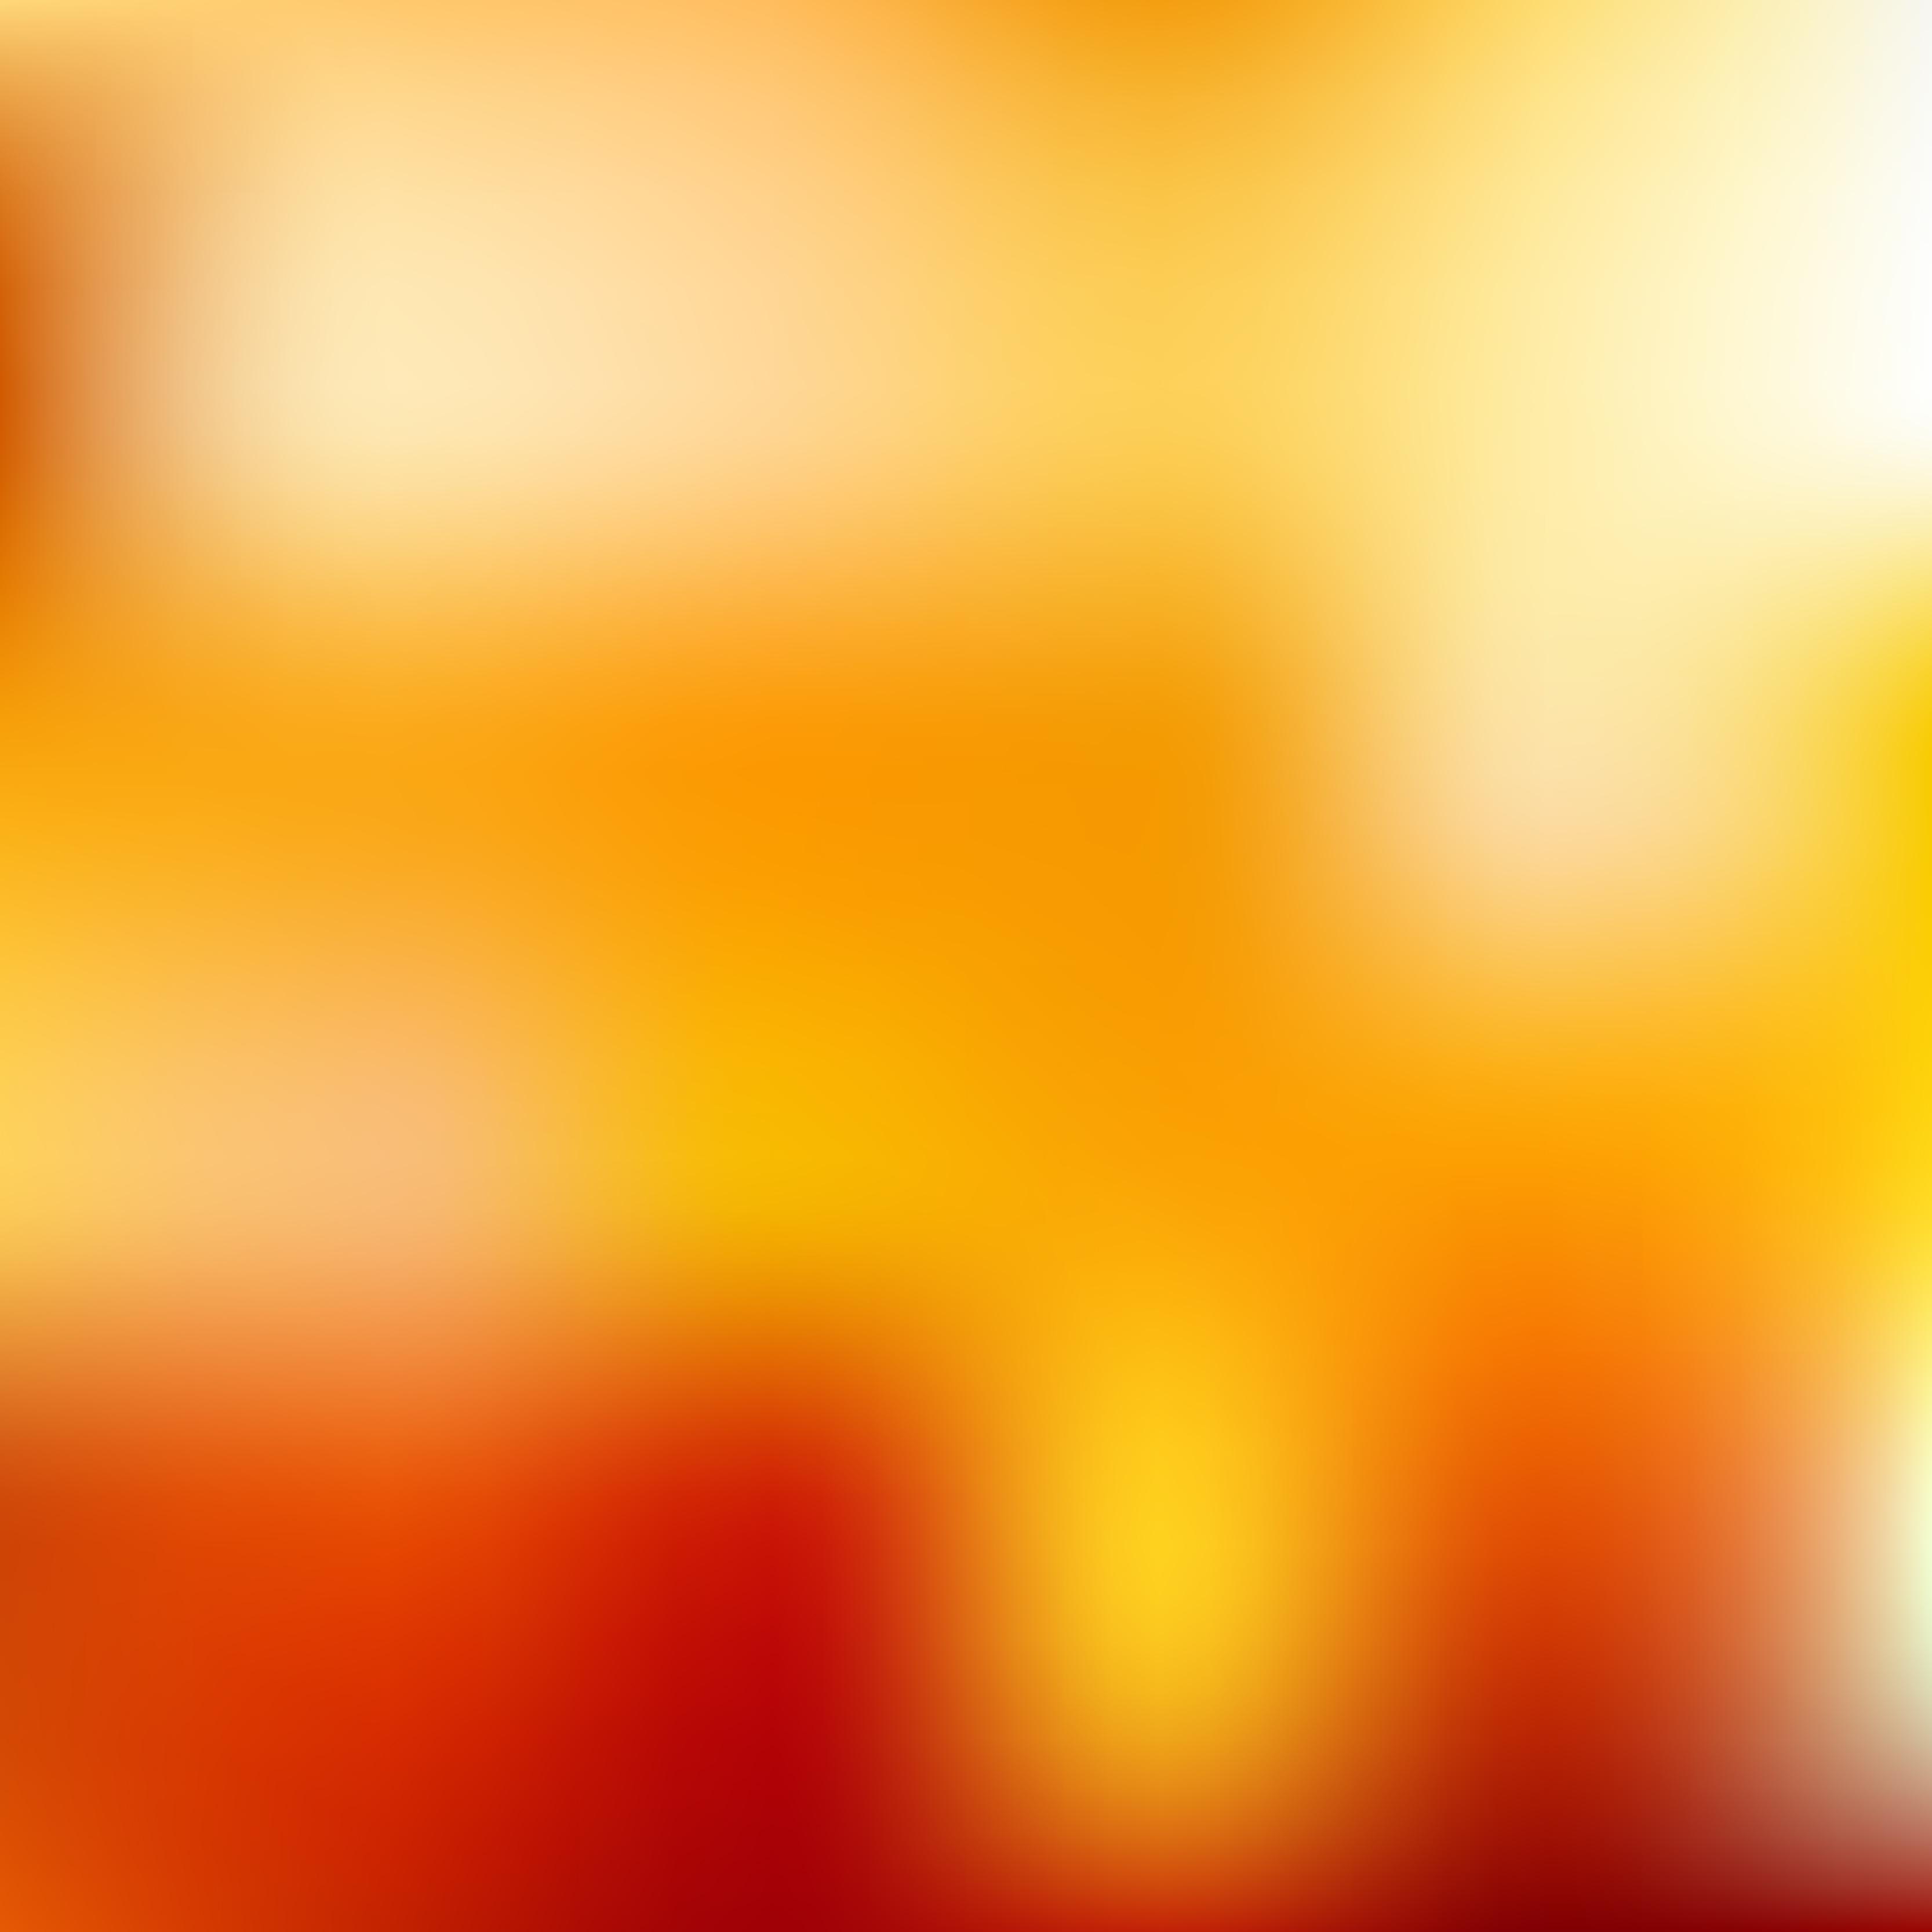 free orange blank background vector